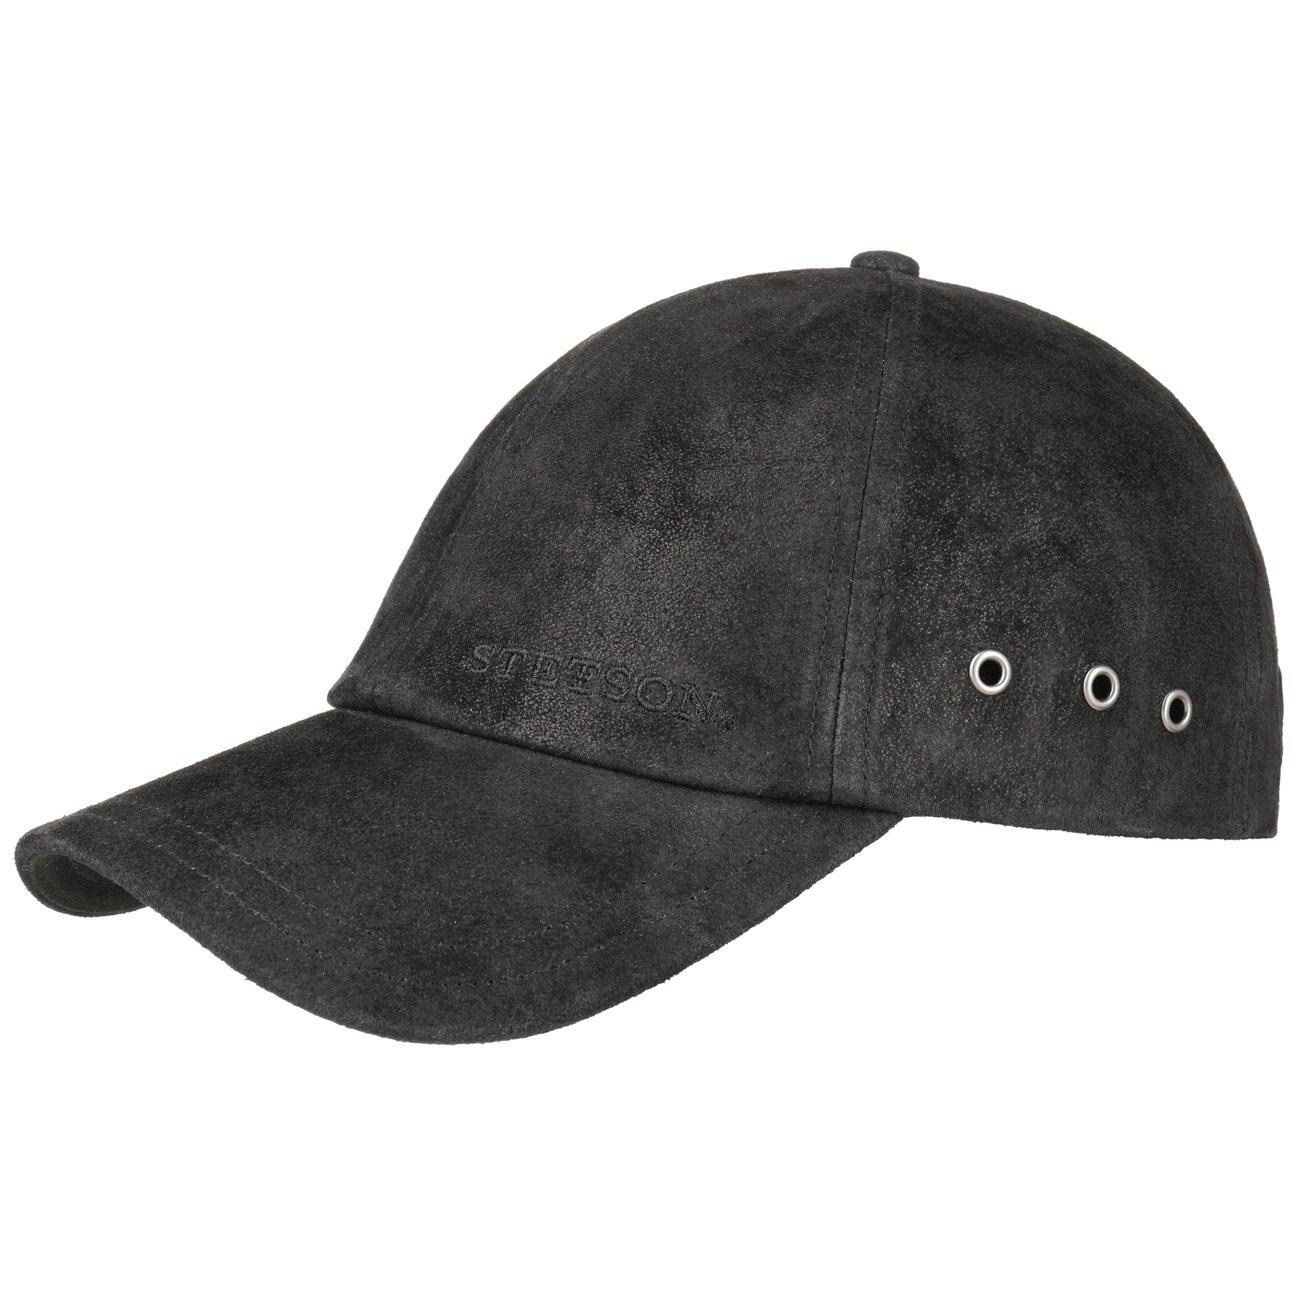 Stetson Men s Leather Baseball Cap (Black) at Amazon Men s Clothing store  4f85c46cd7d9